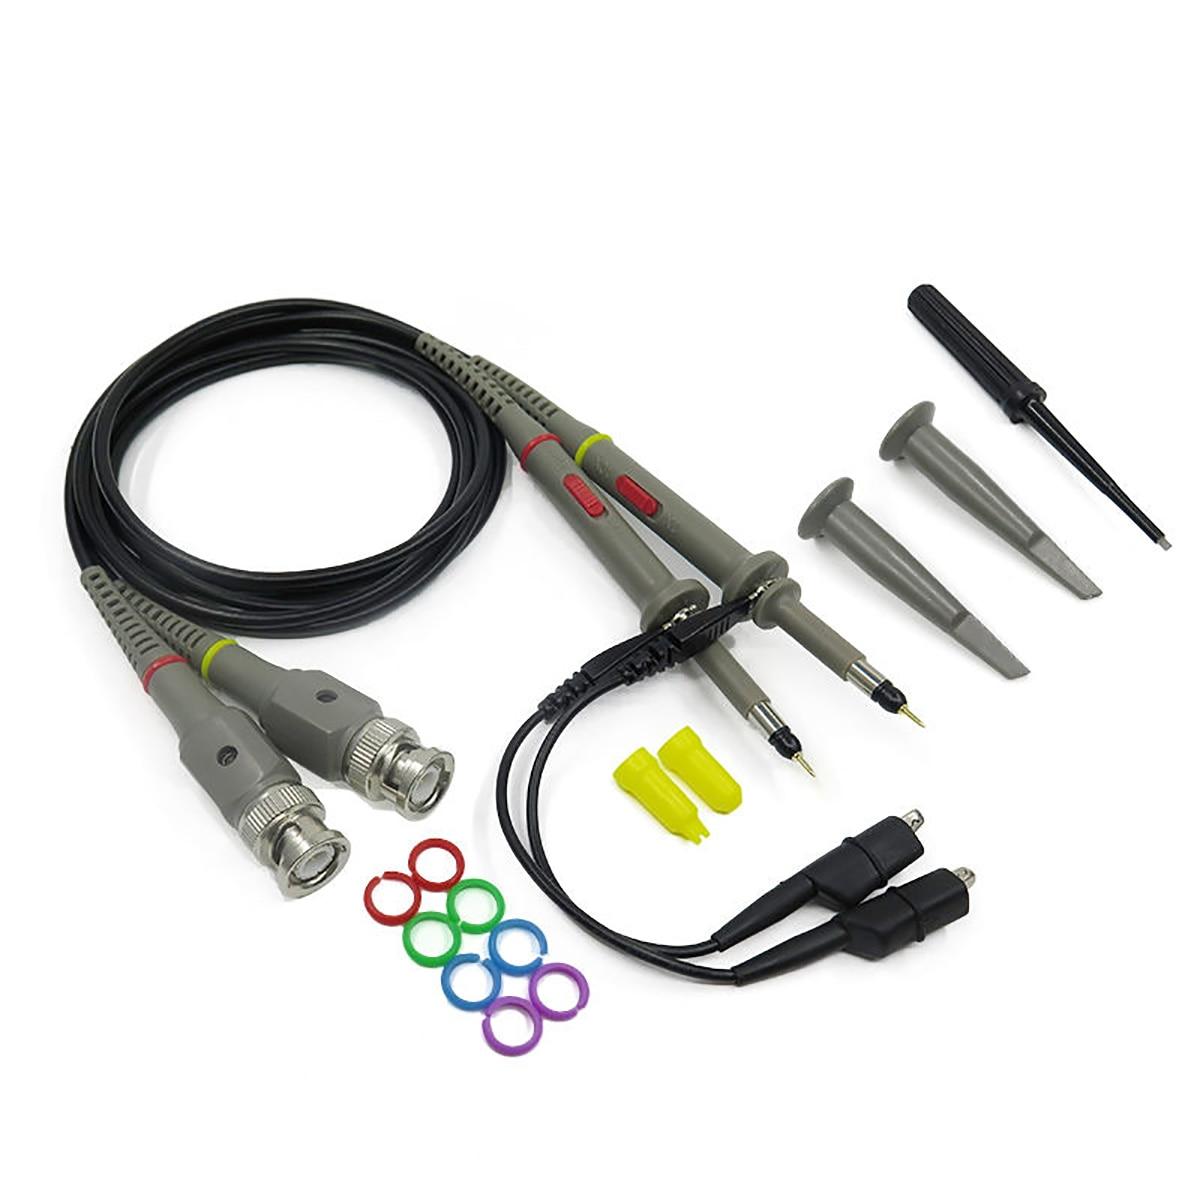 2pcs 100MHz Oscilloscope Probe 1X 10X Attenuation Scope Analyzer Alligator Clip Probes Test Leads font b